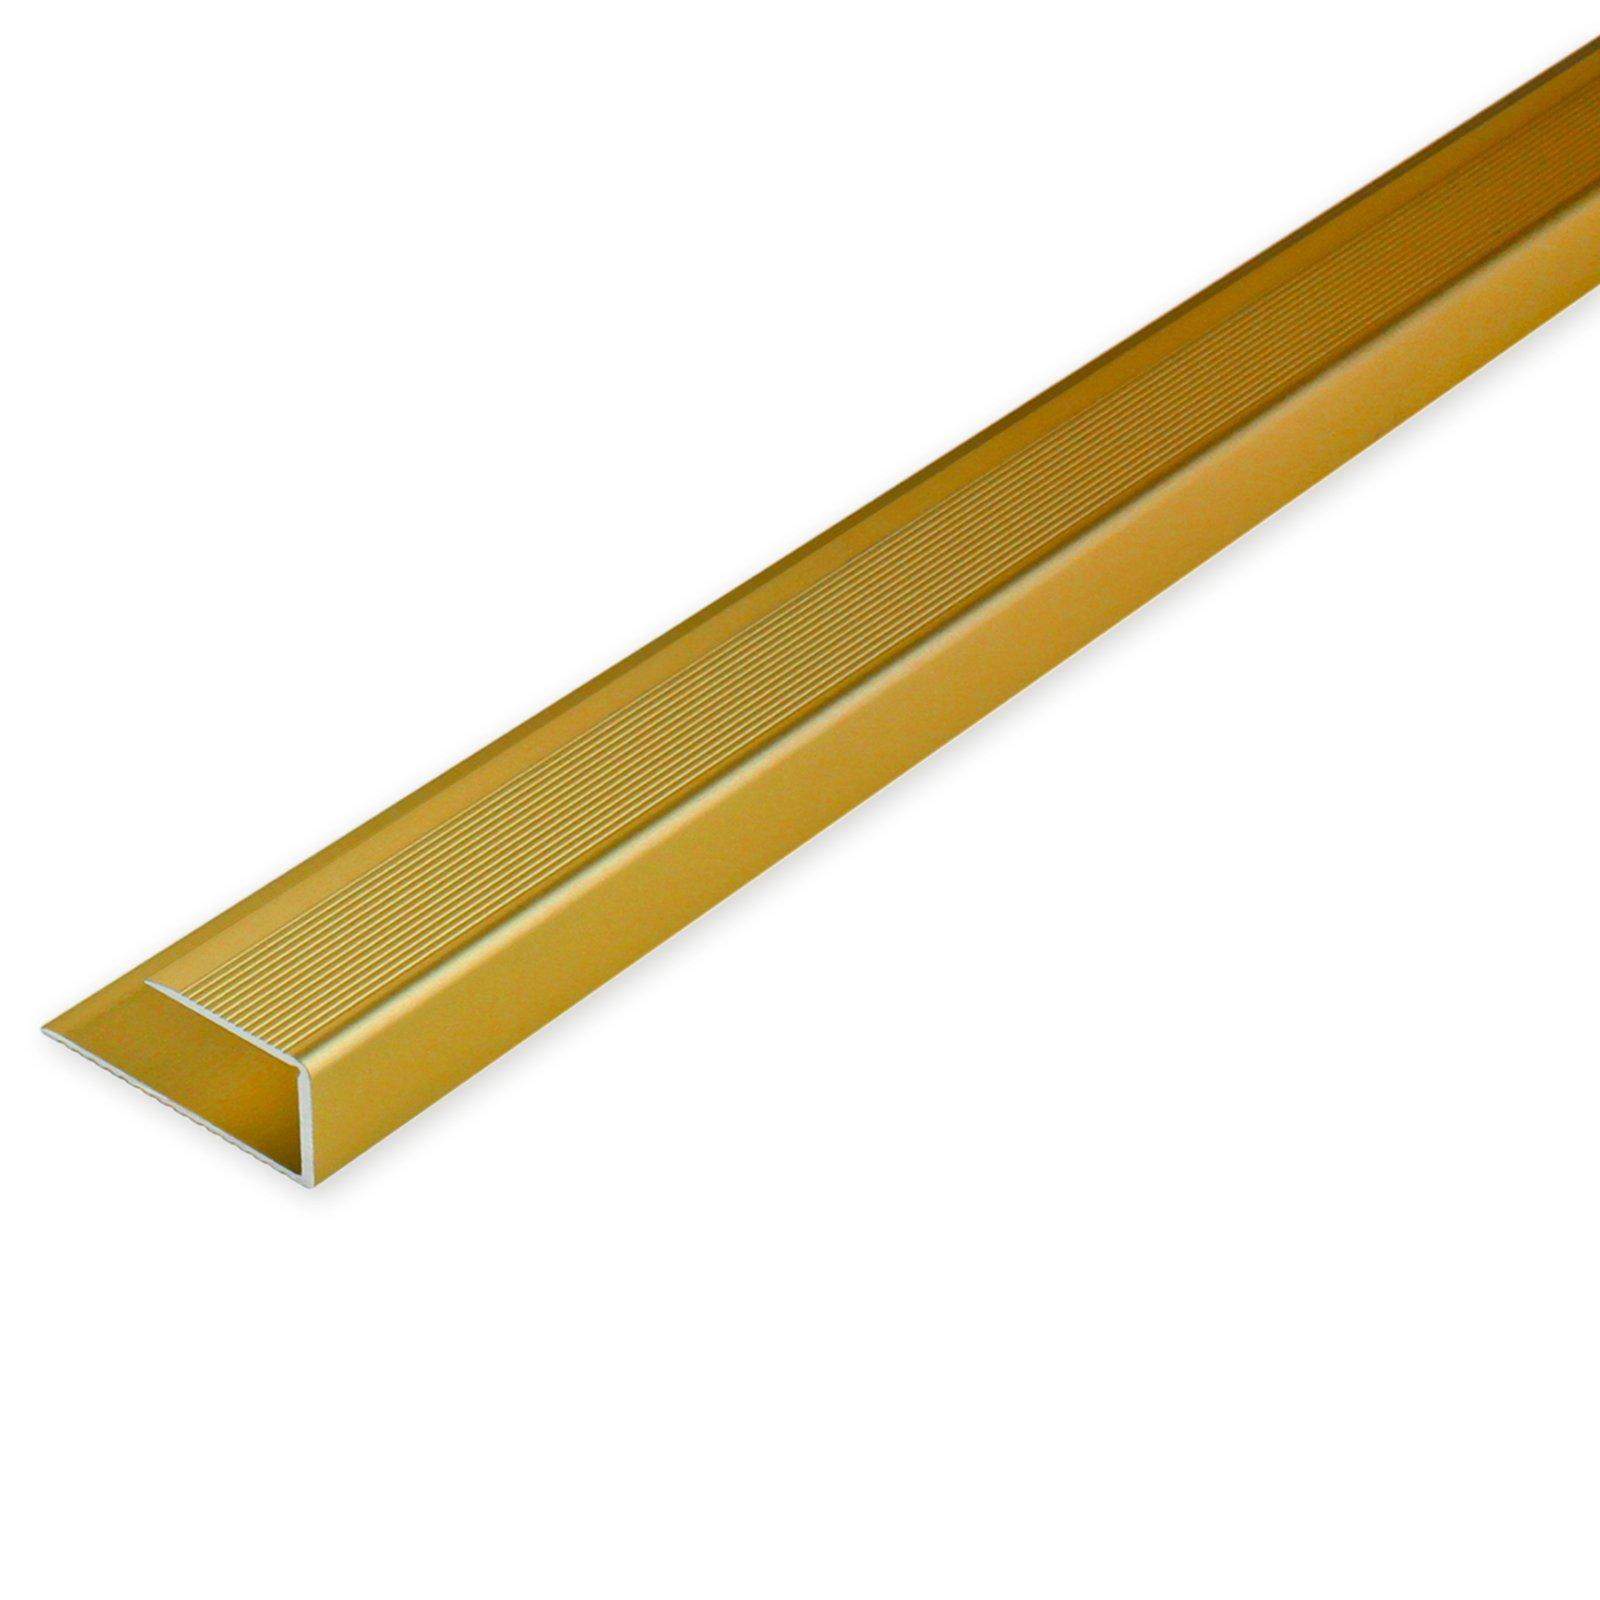 Abschlussschiene - gold - Aluminium - 90 cm